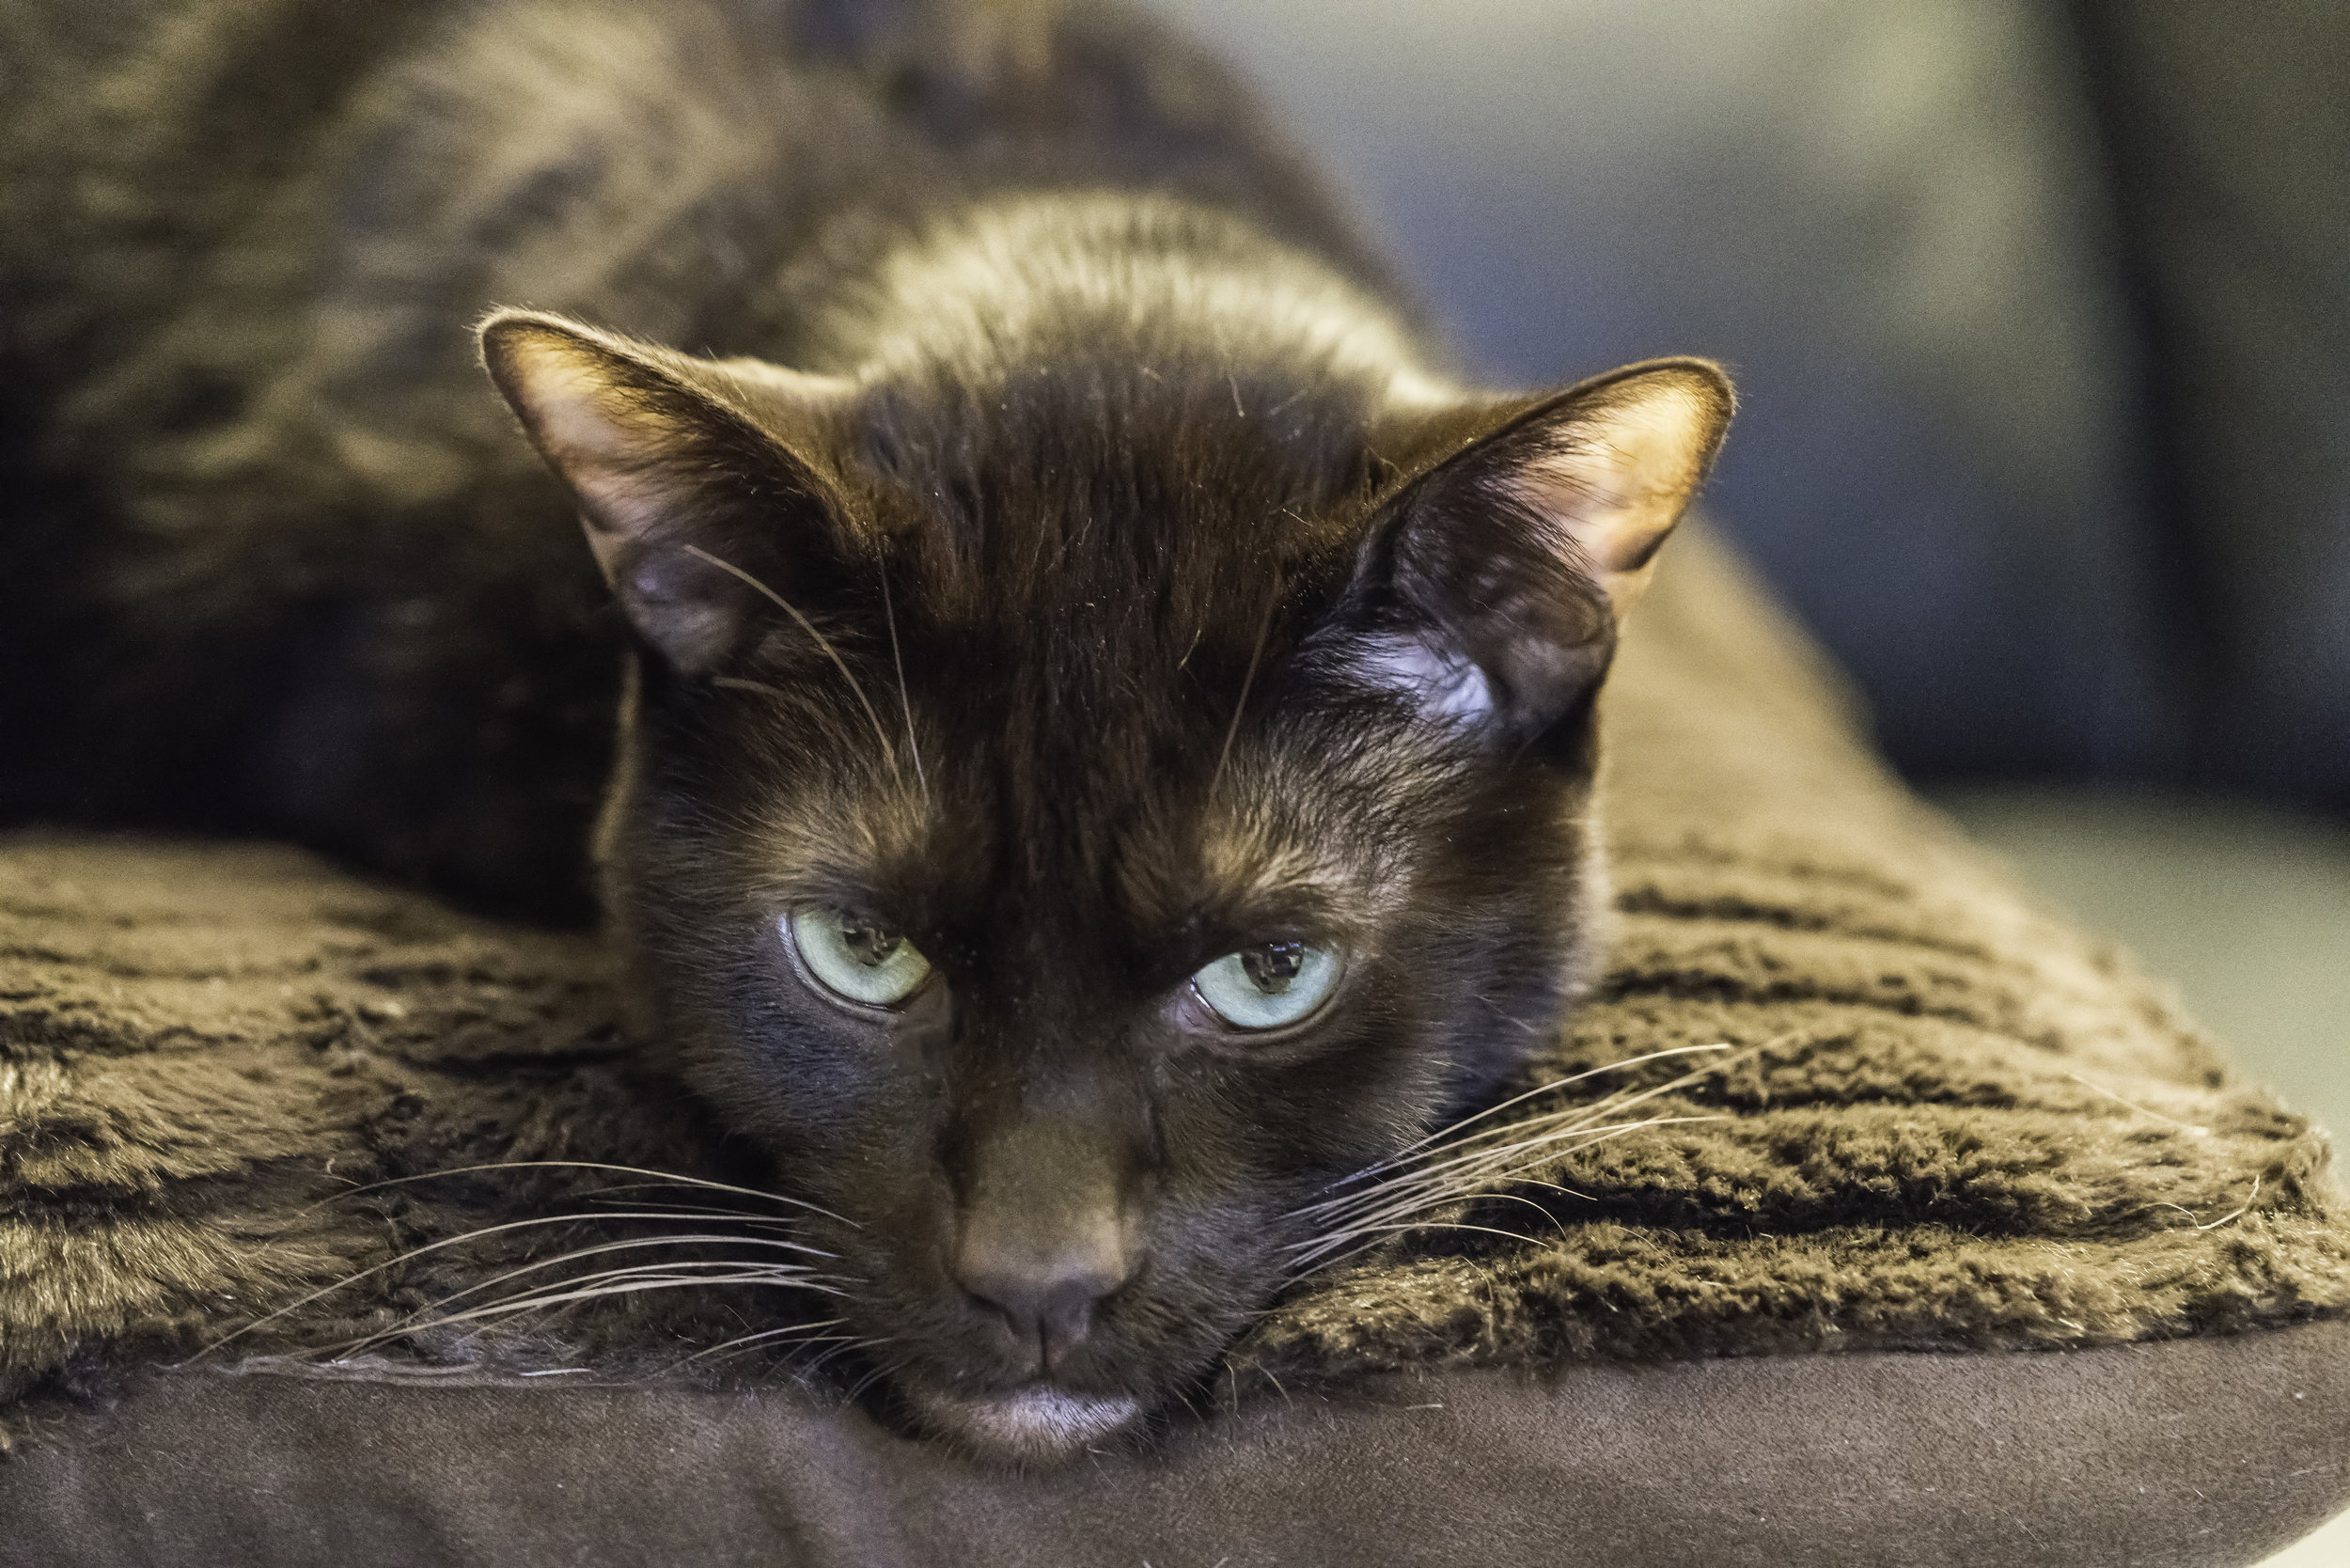 Pet Coco, 2015, posing